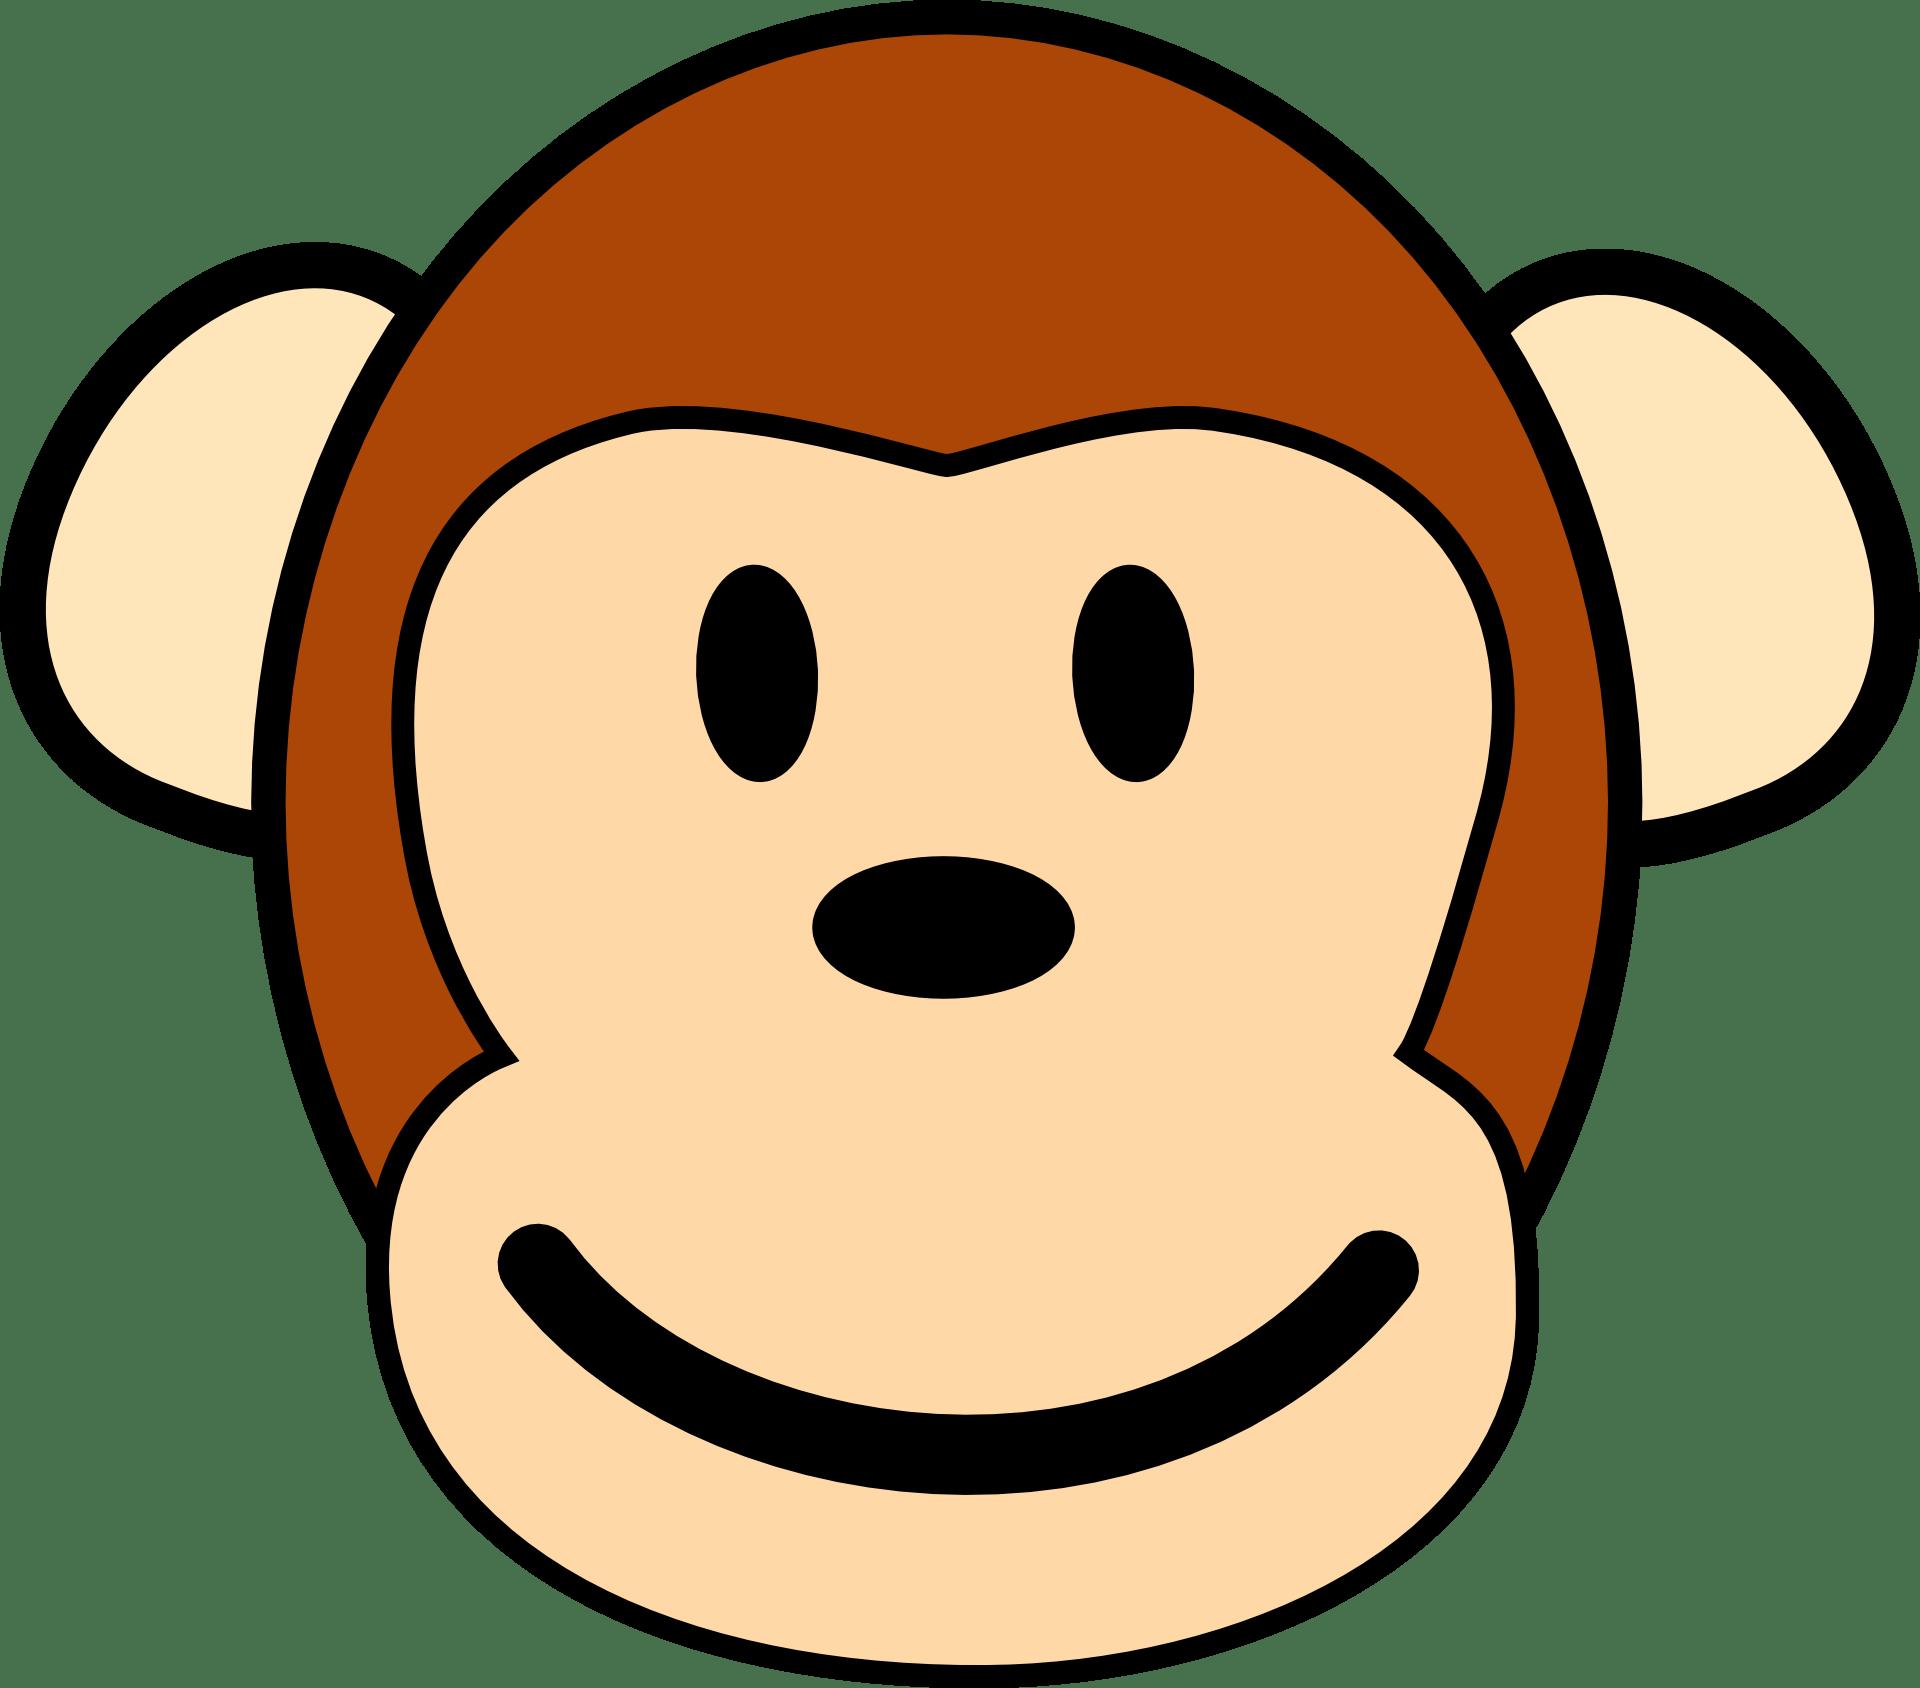 Happy Cartoon Monkey Face Free Image